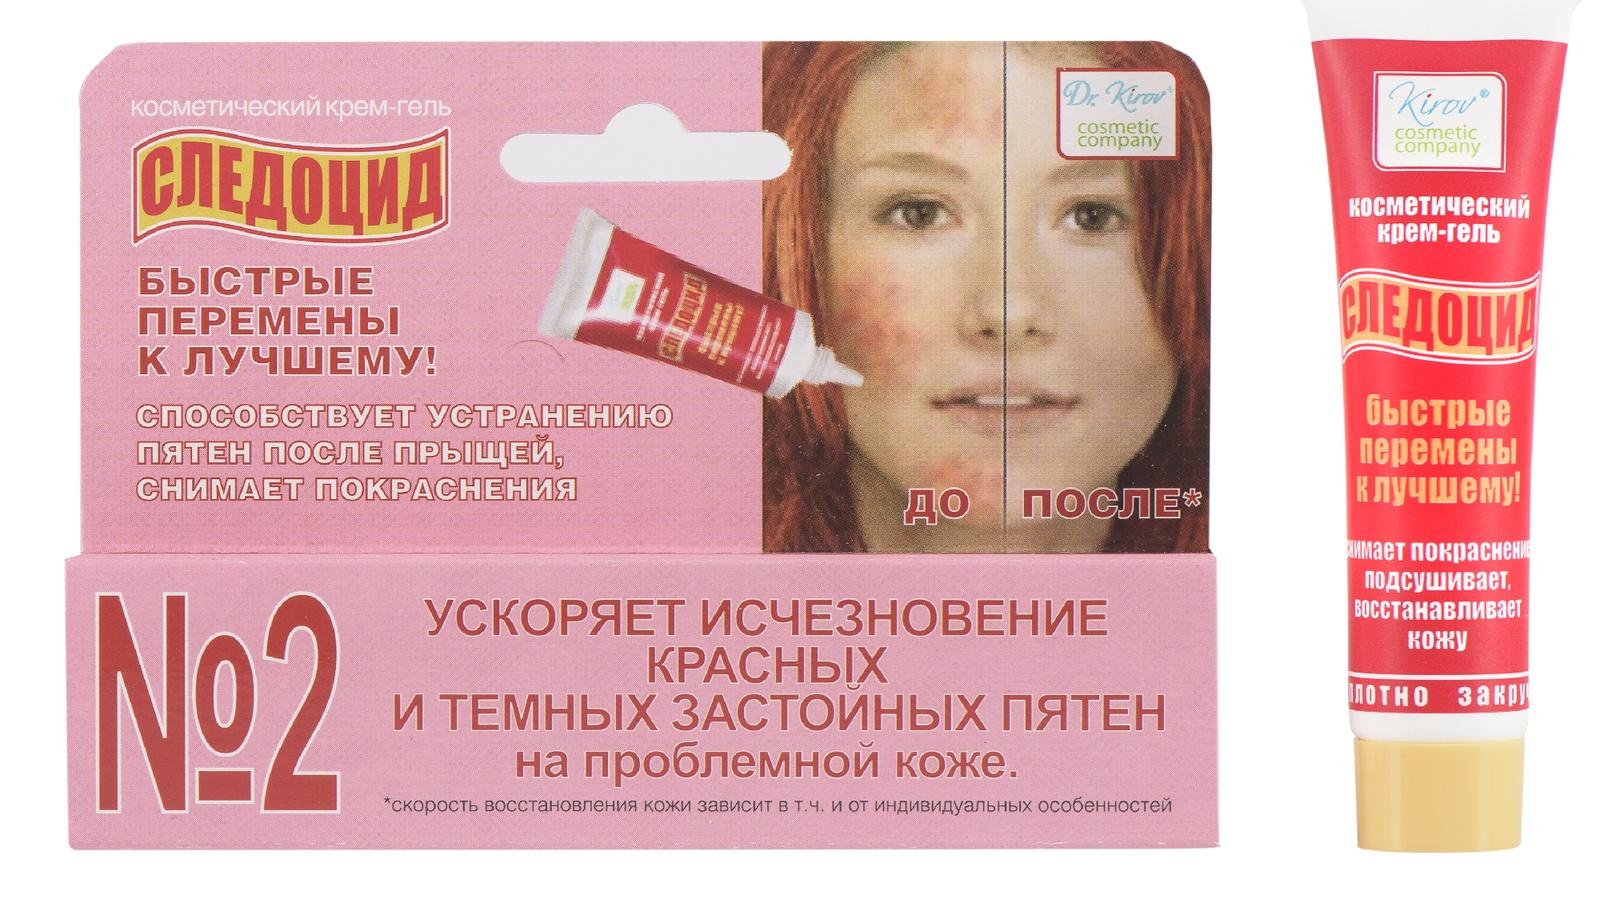 Dr.Kirov Cosmetic Company, Крем-гель Следоцид, 15 мл. купероз розацеа